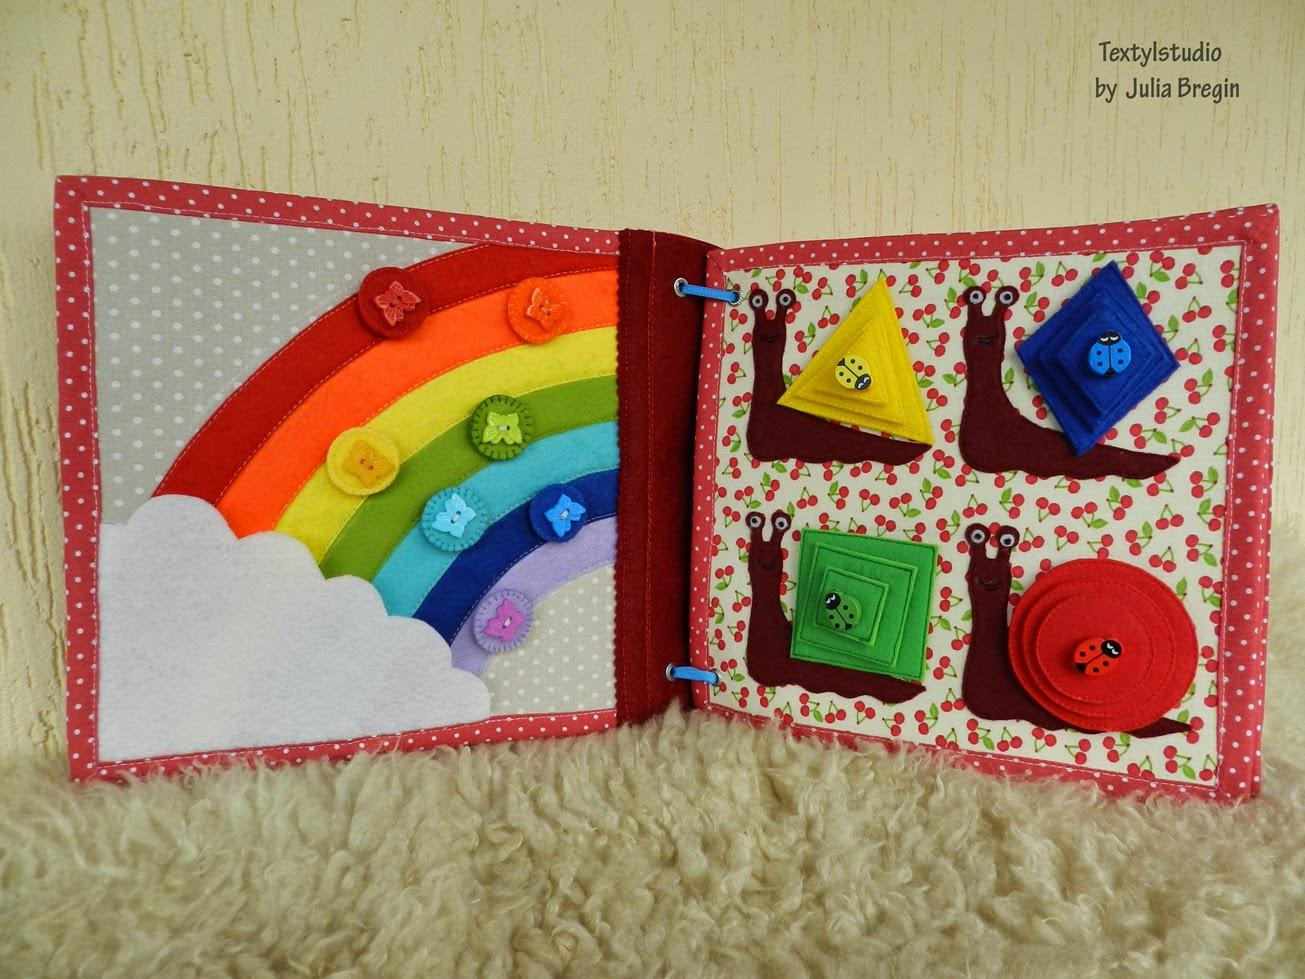 Quiet book, розвиваюча книжка, розвивальна книжка, текстильна книжка, тиха книга, развивающая книга, книжка ручной работы, развитие моторики